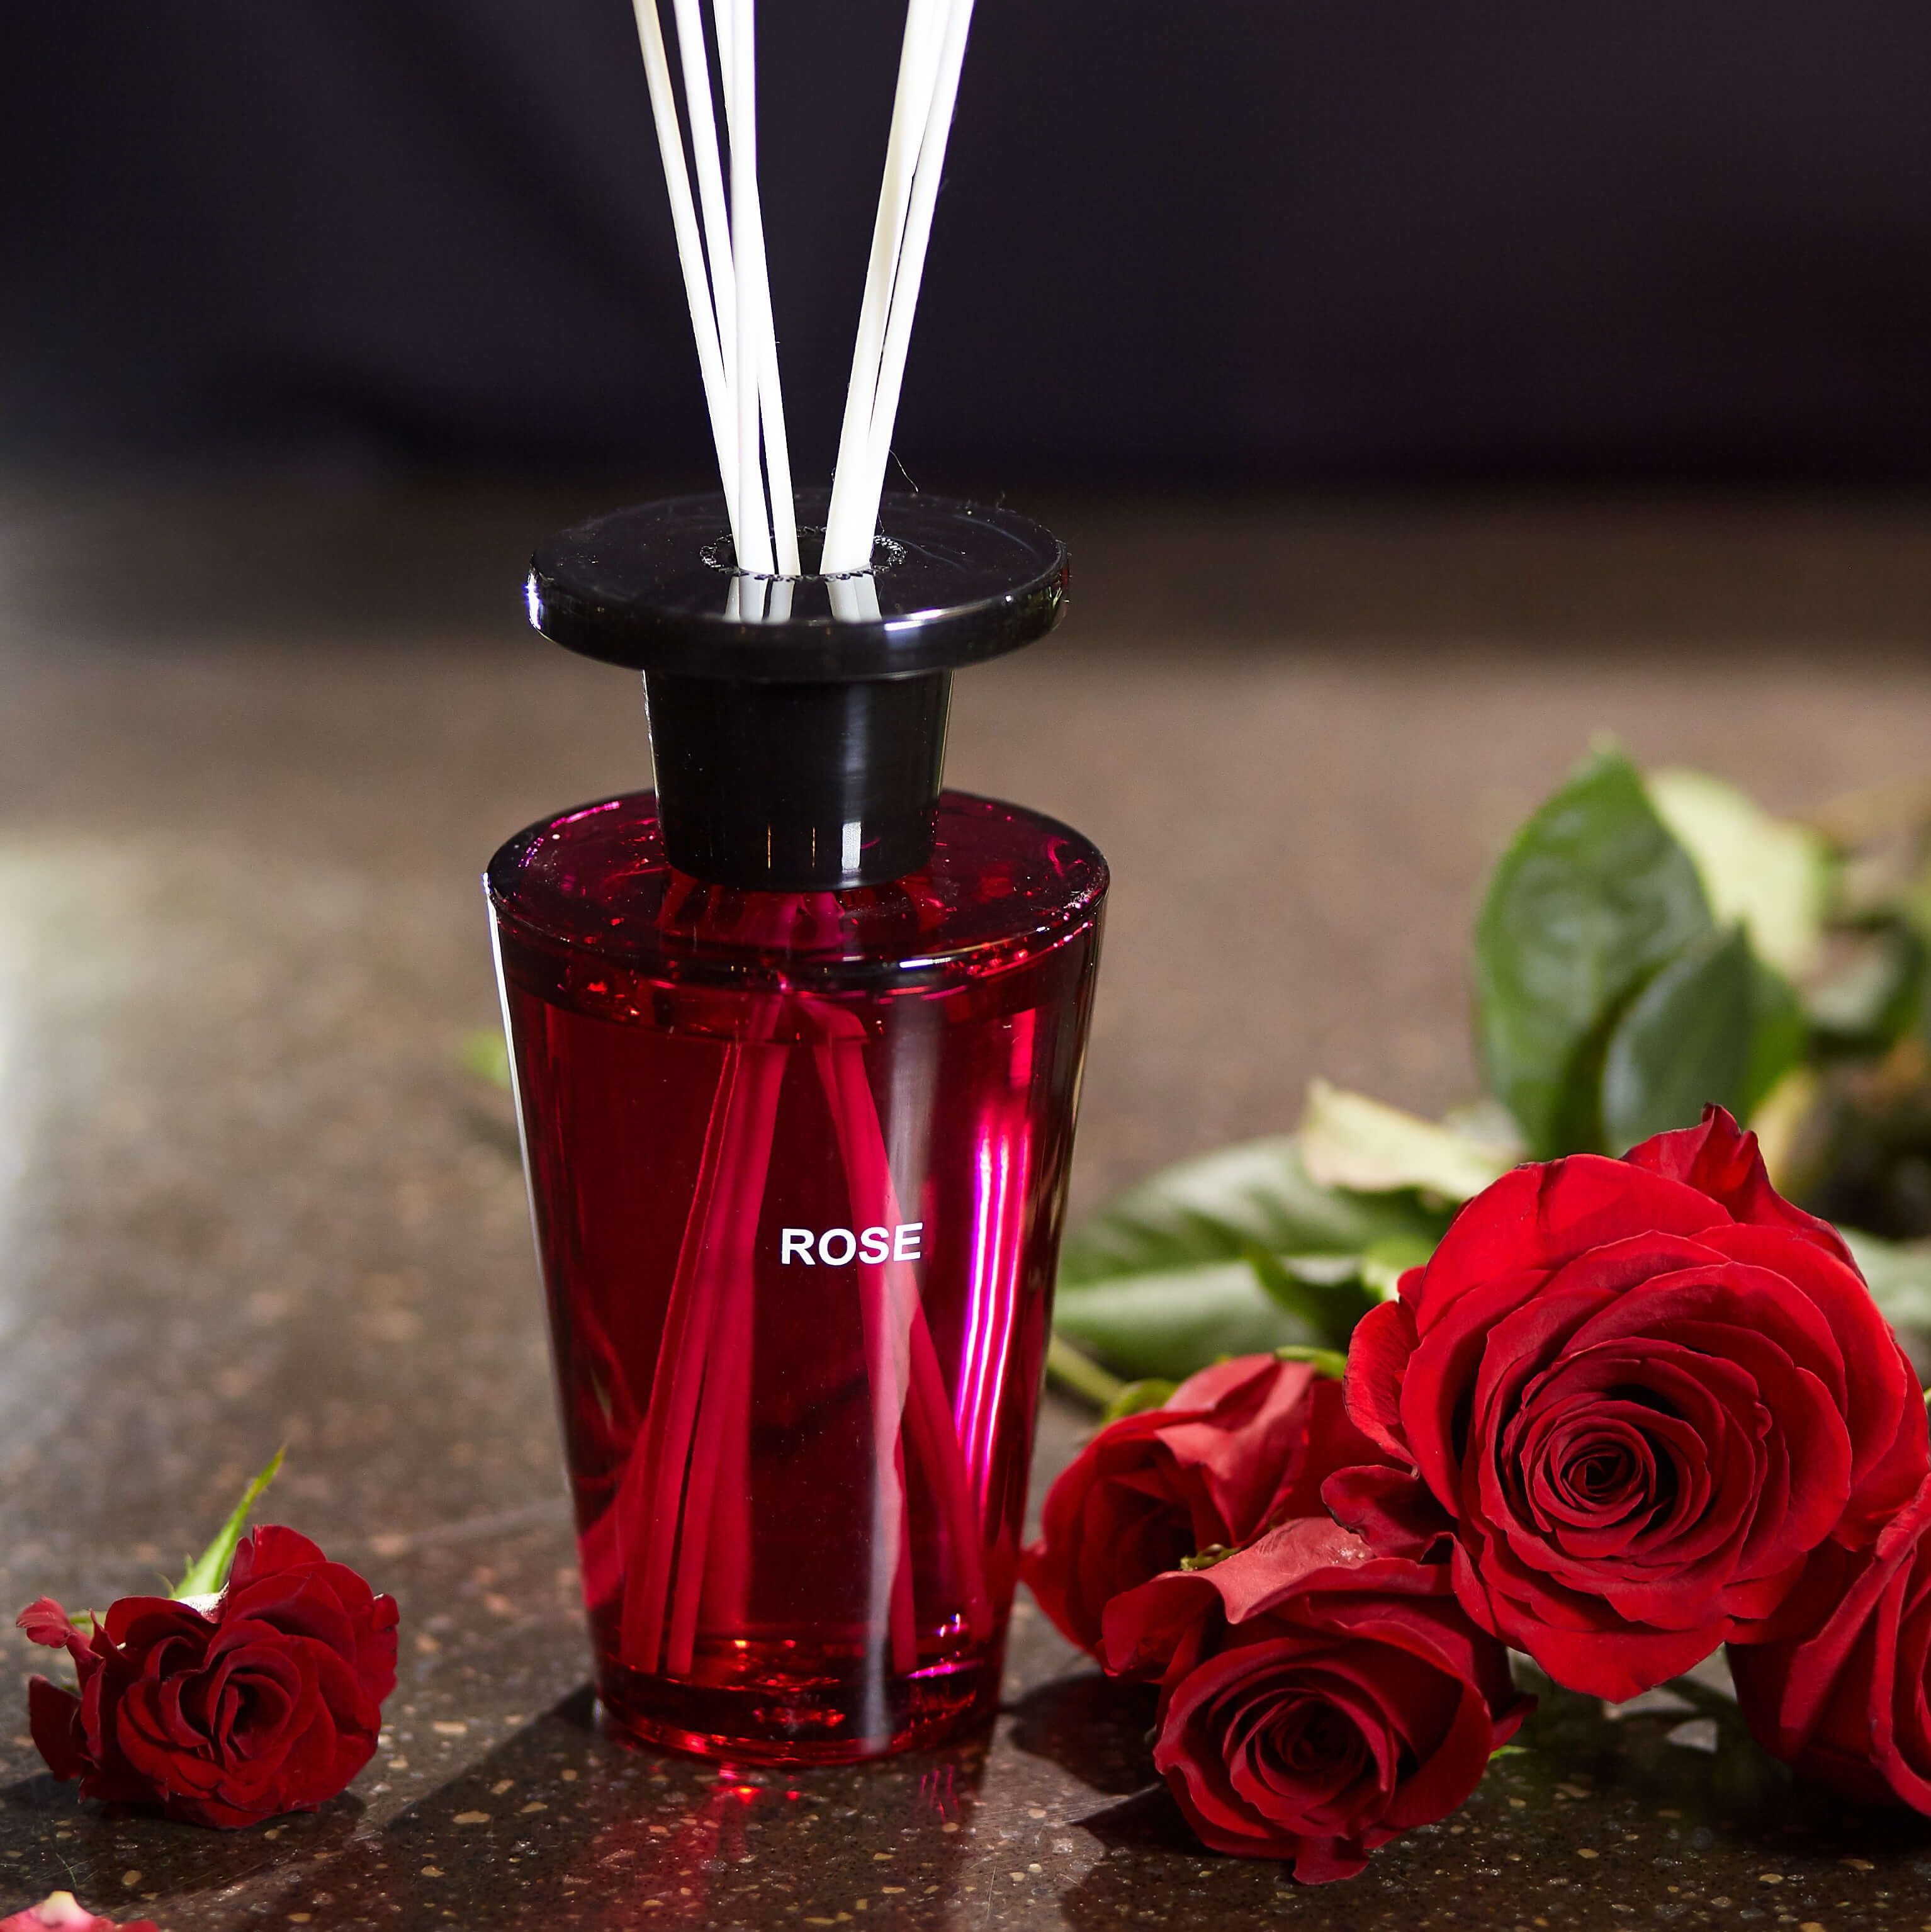 ароматы с запахом розы фото пятницу пиво залог